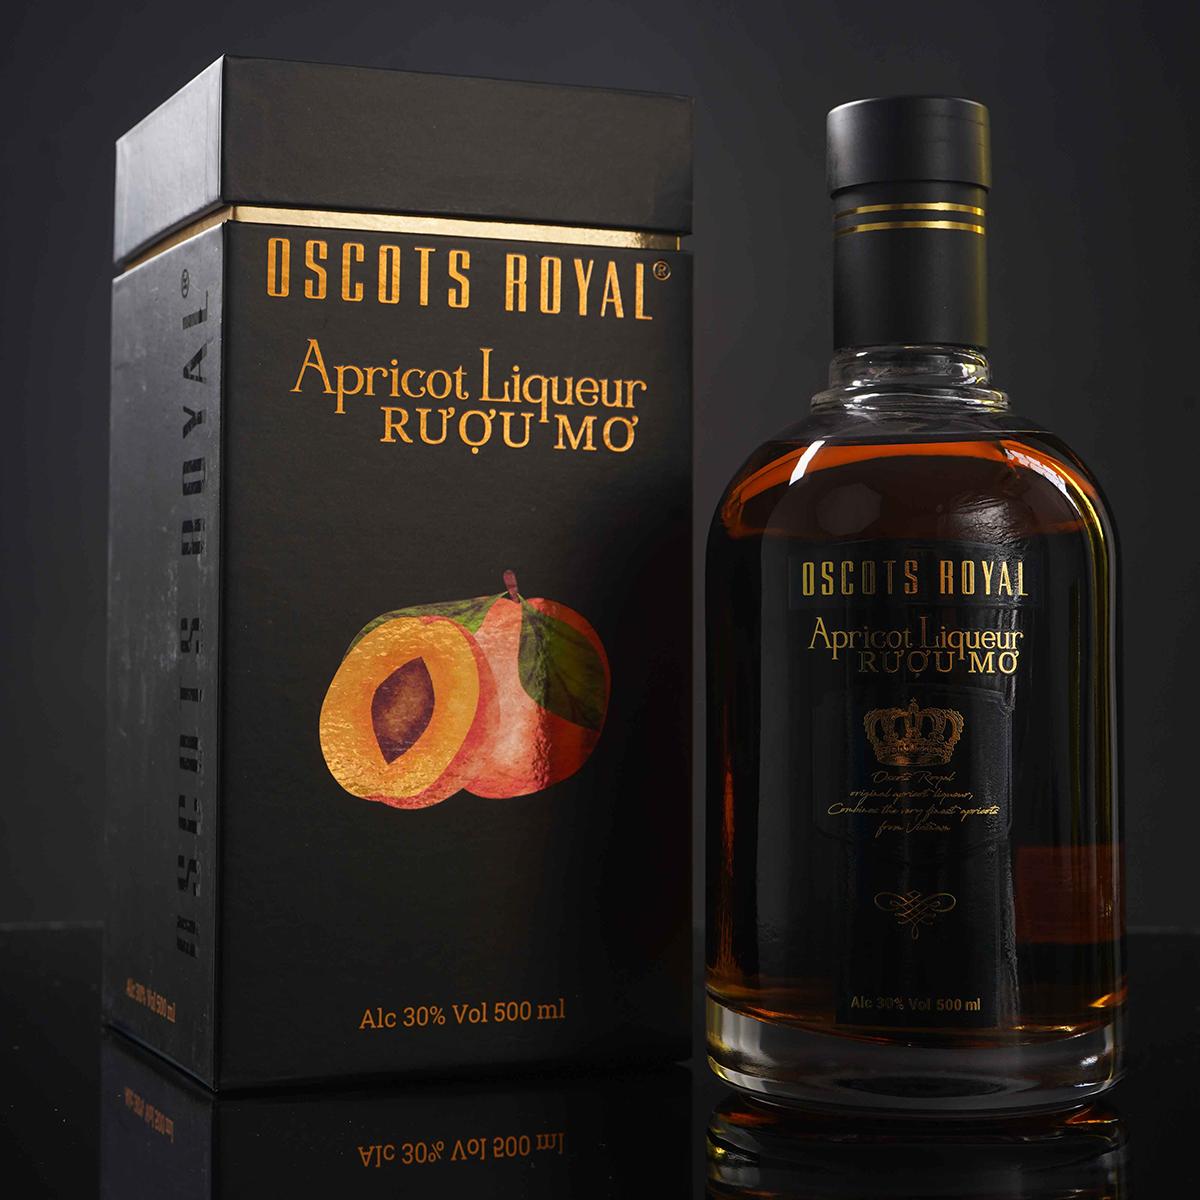 RƯỢU MƠ Oscots Royal Apricot Liqueur